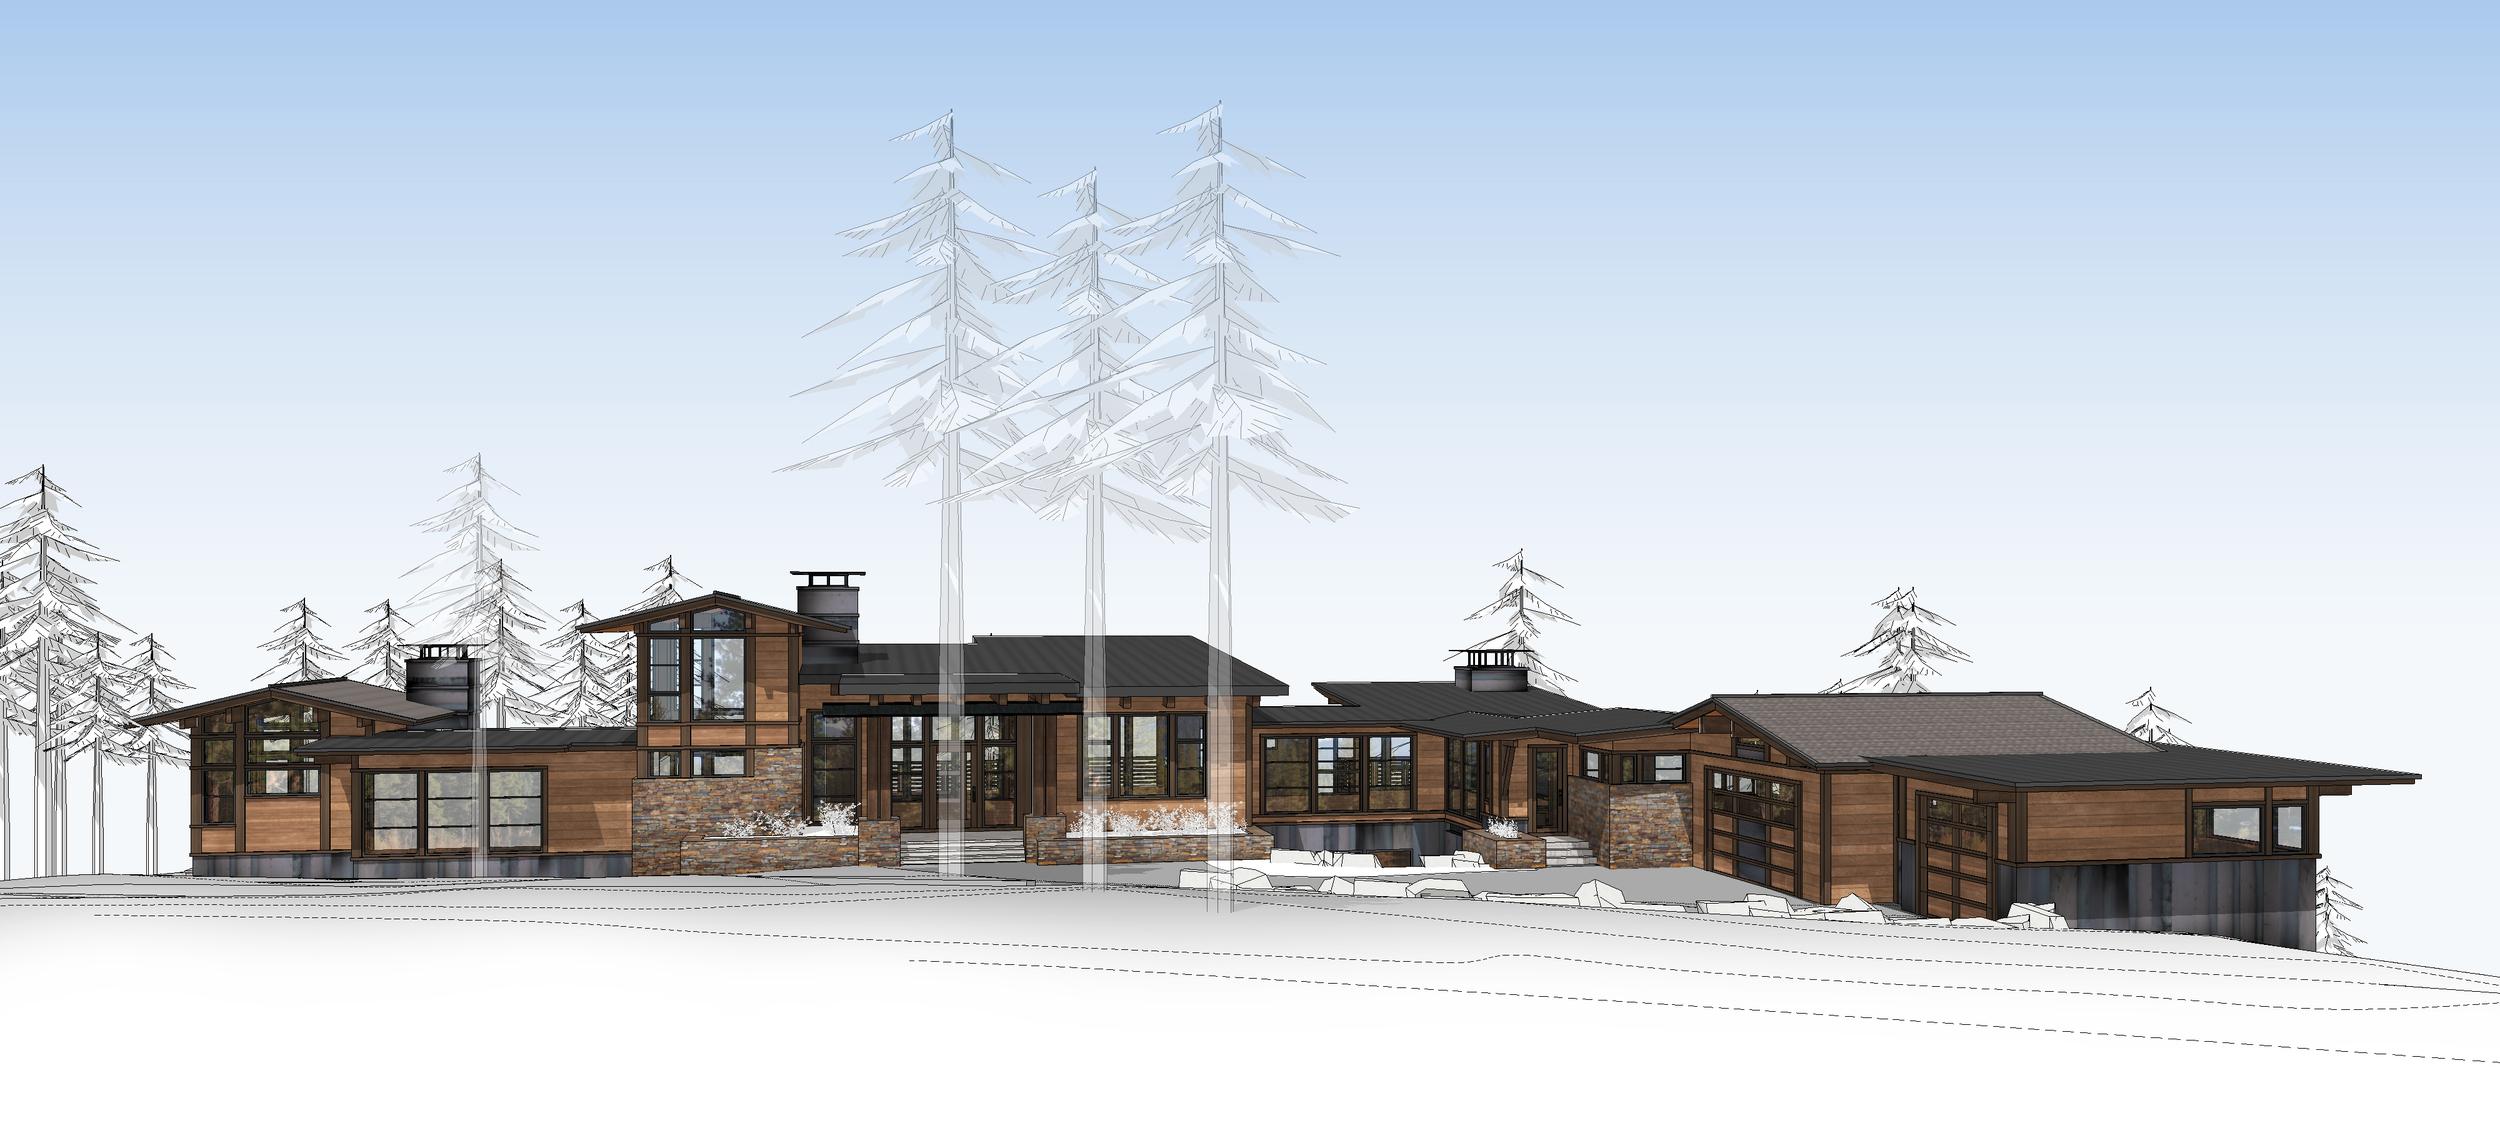 Contractor: Lamperti Construction   Square Footage: 6,441 sf bedrooms: 5 bathrooms: 5.5